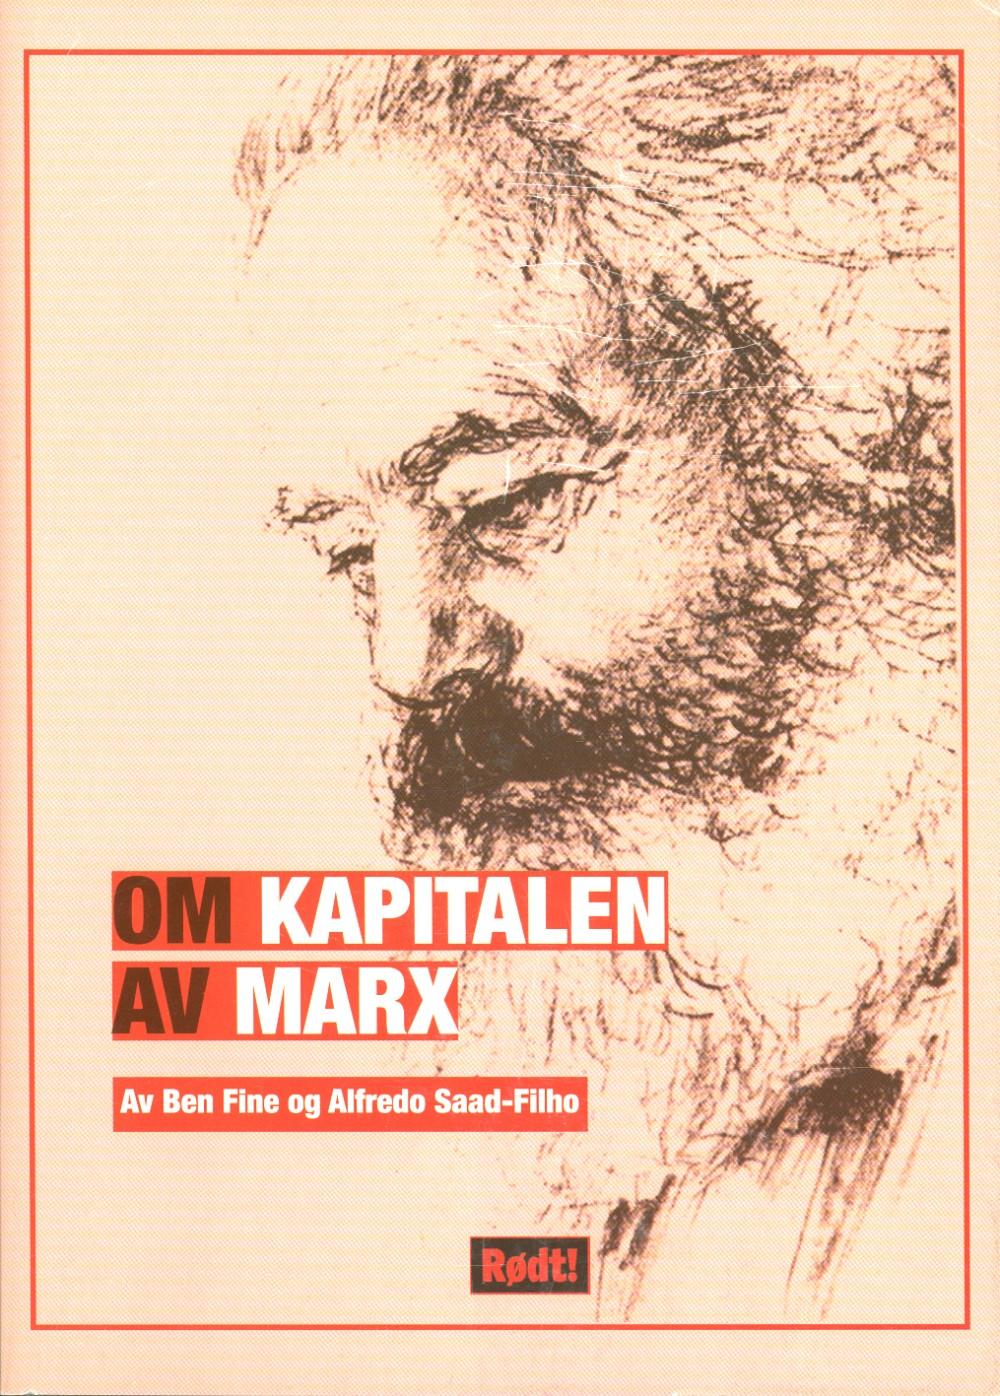 Ben Fine, Alfredo Saad-Filho: Om Kapitalen av Marx